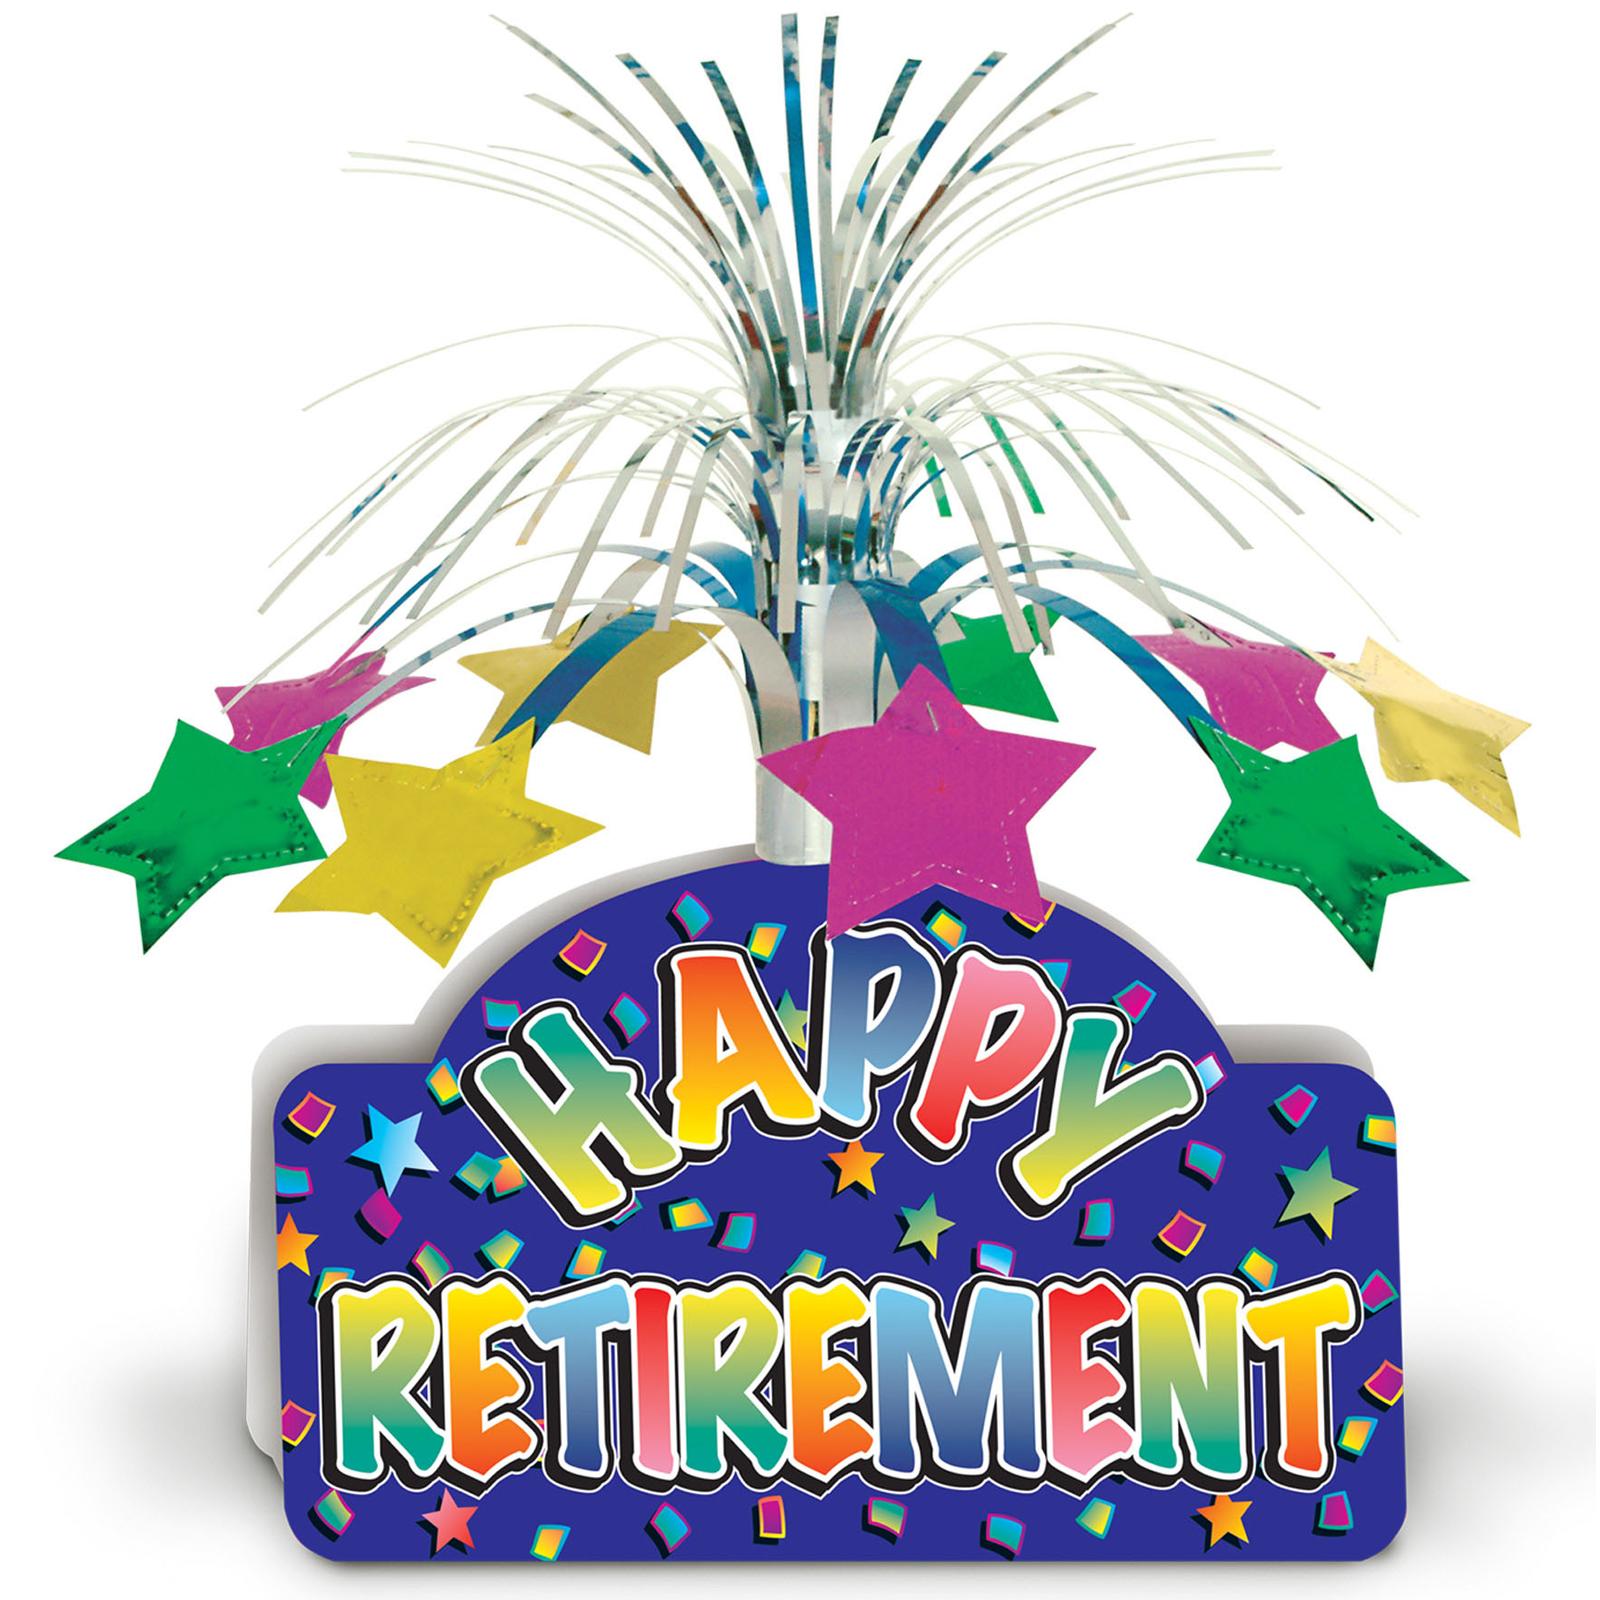 1600x1600 Happy Retirement Clipart